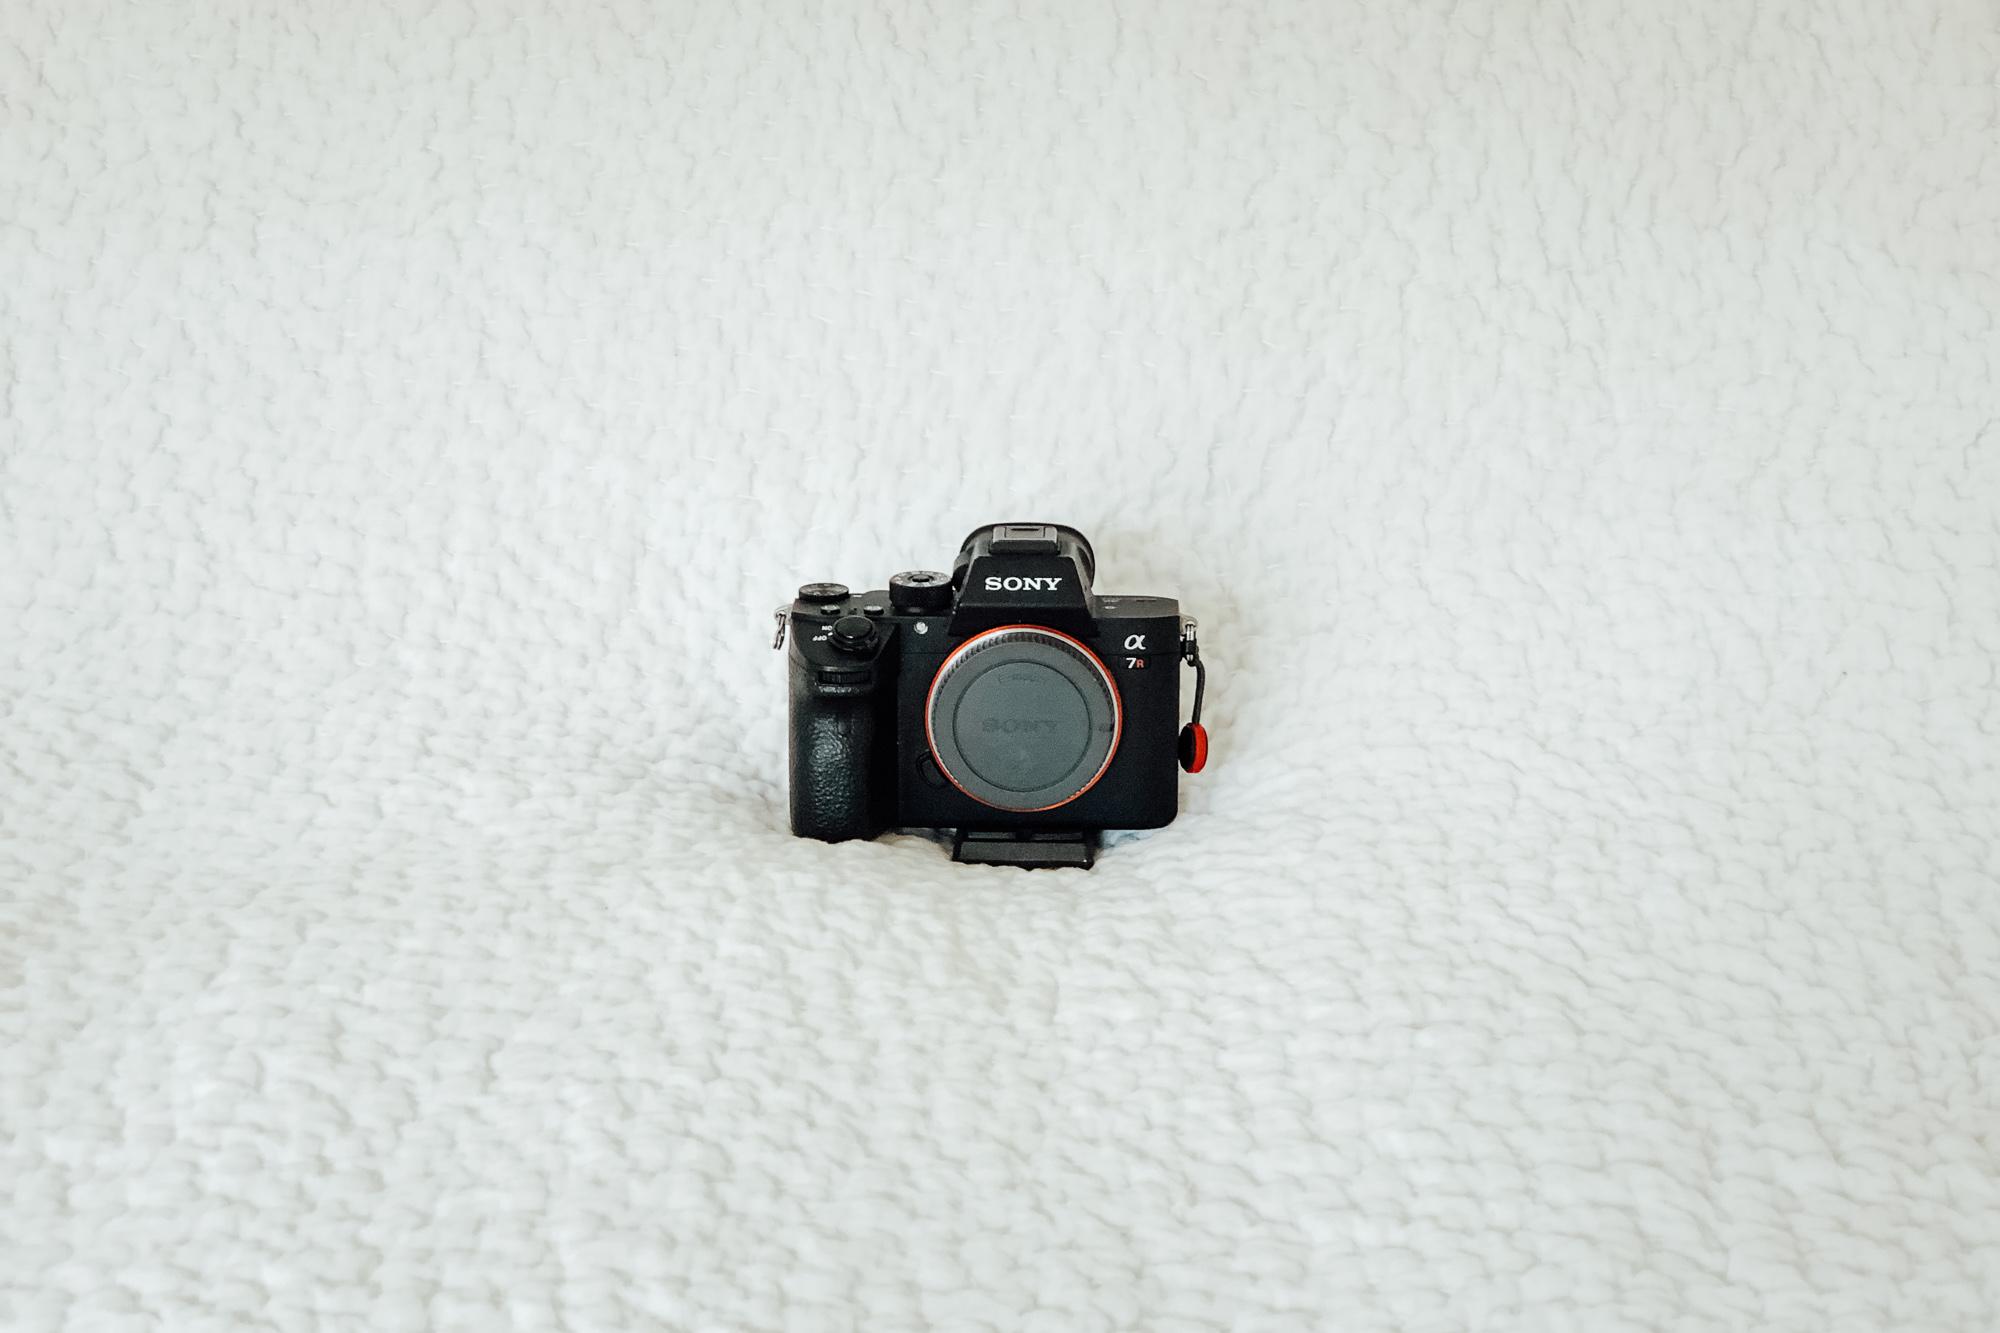 Travel Photography Gear Sony a7riii Camera Body